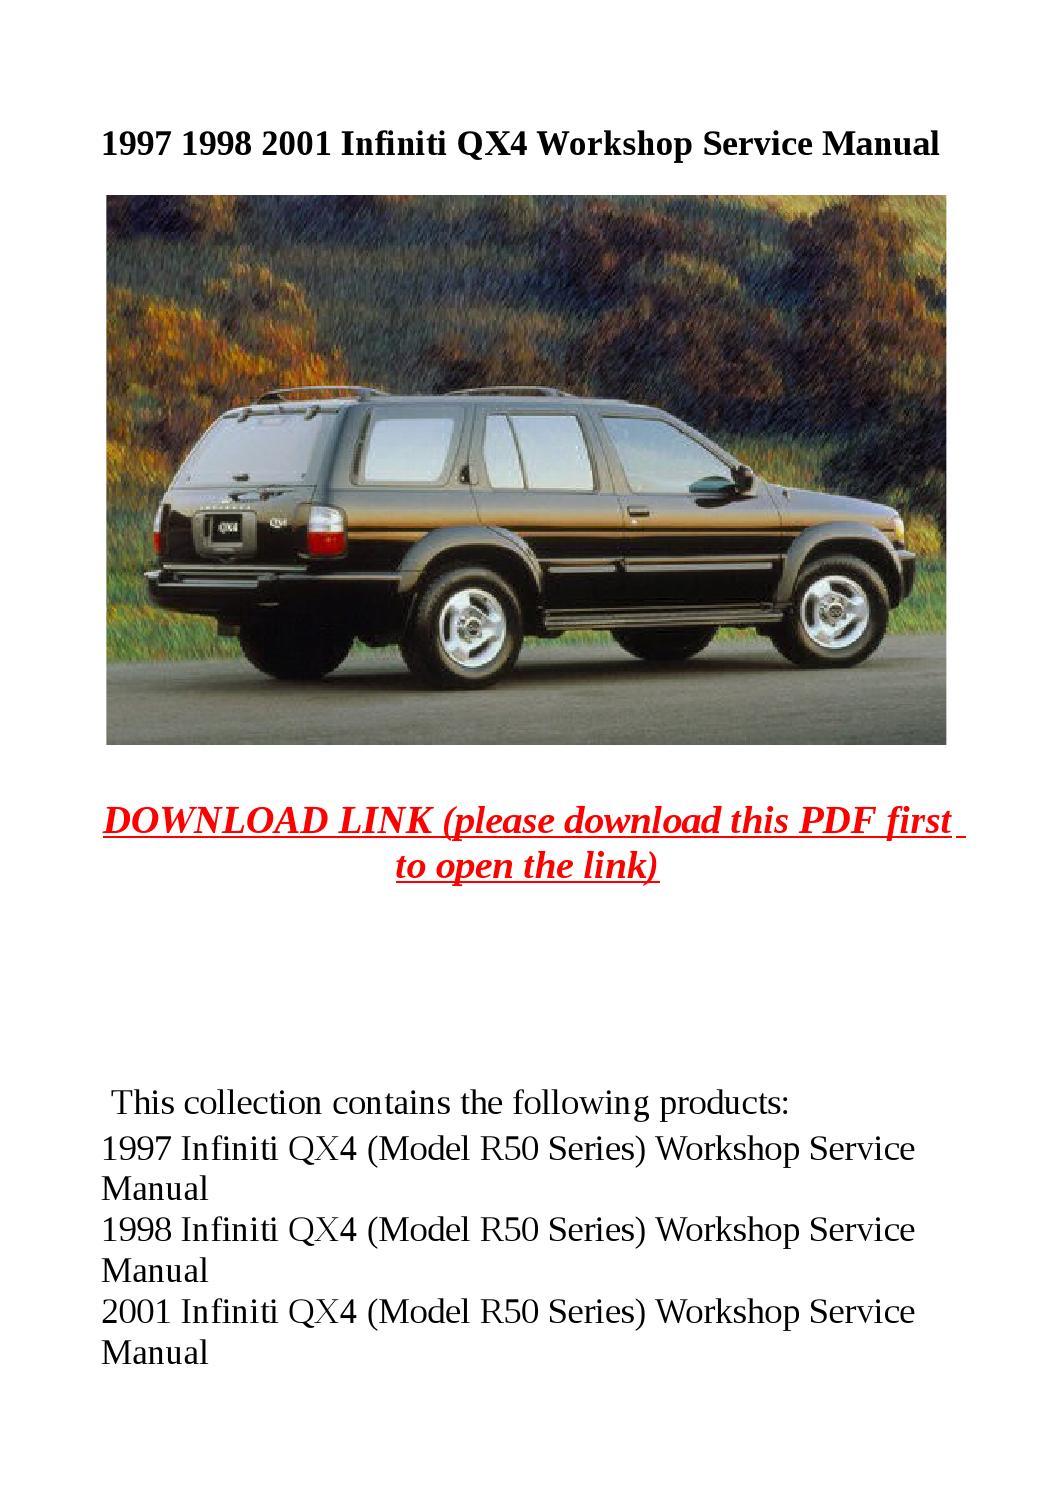 1997 1998 2001 infiniti qx4 workshop service manual by. Black Bedroom Furniture Sets. Home Design Ideas